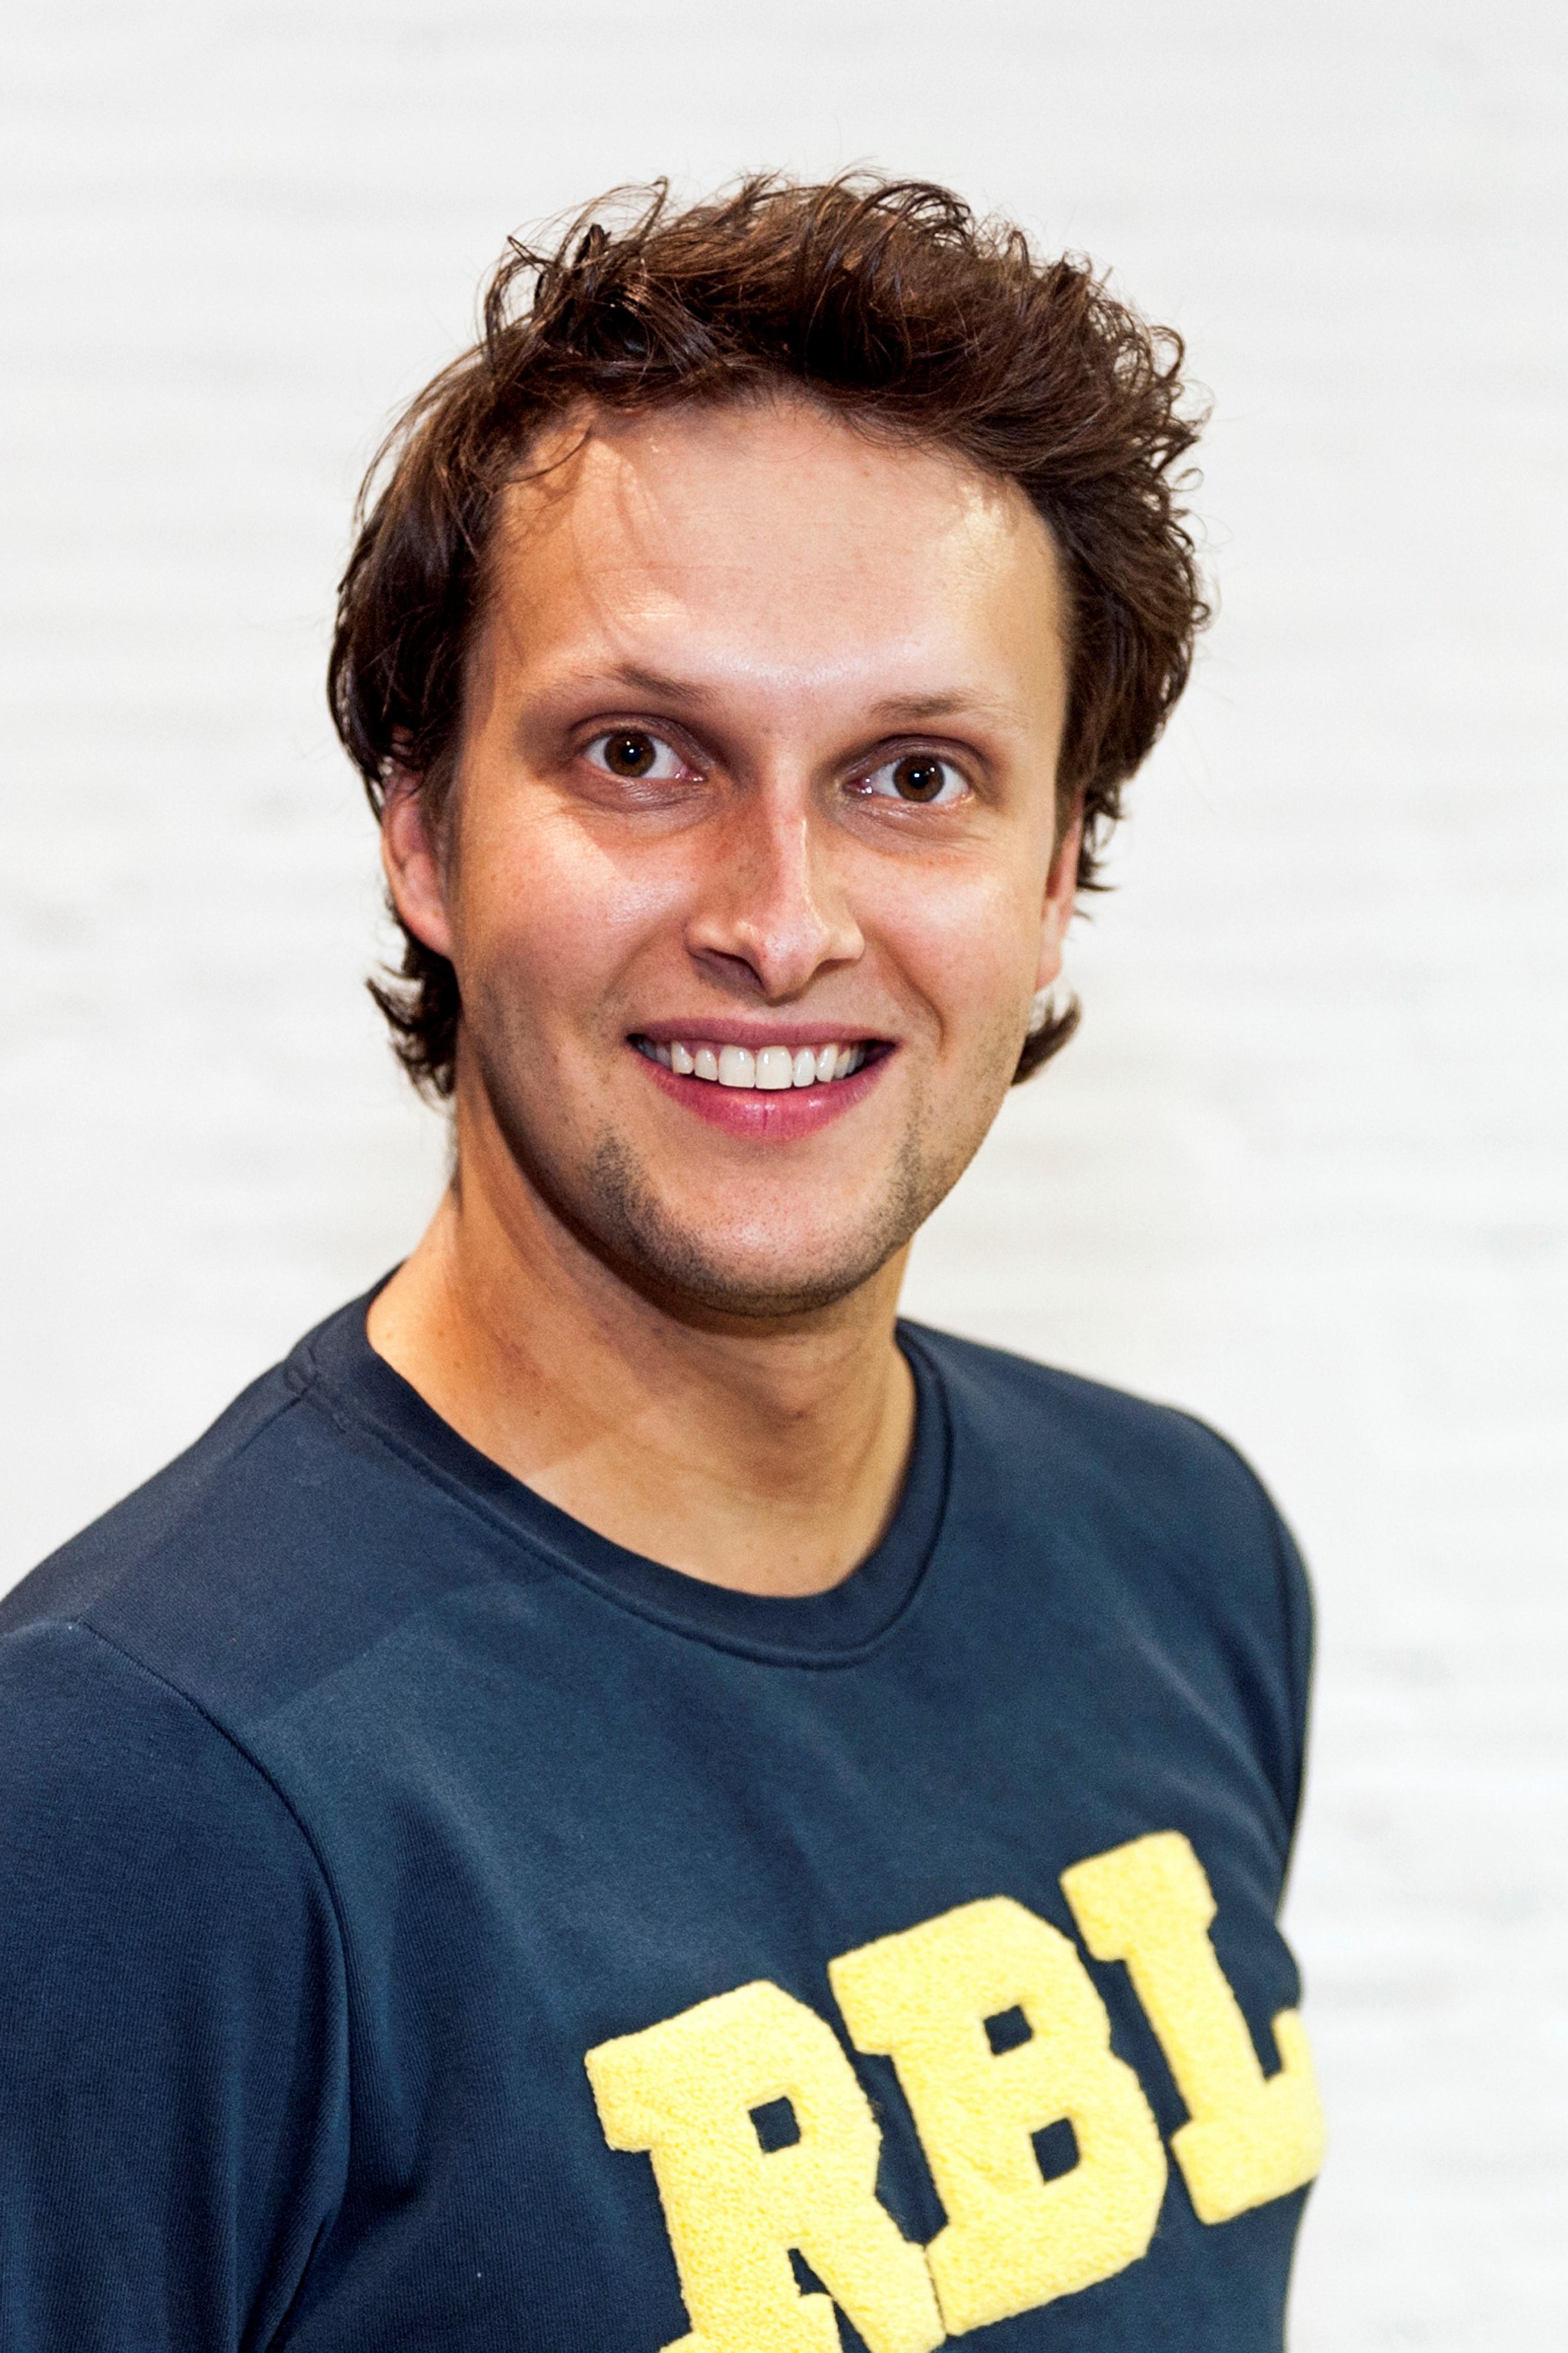 Martijn Hendrickx